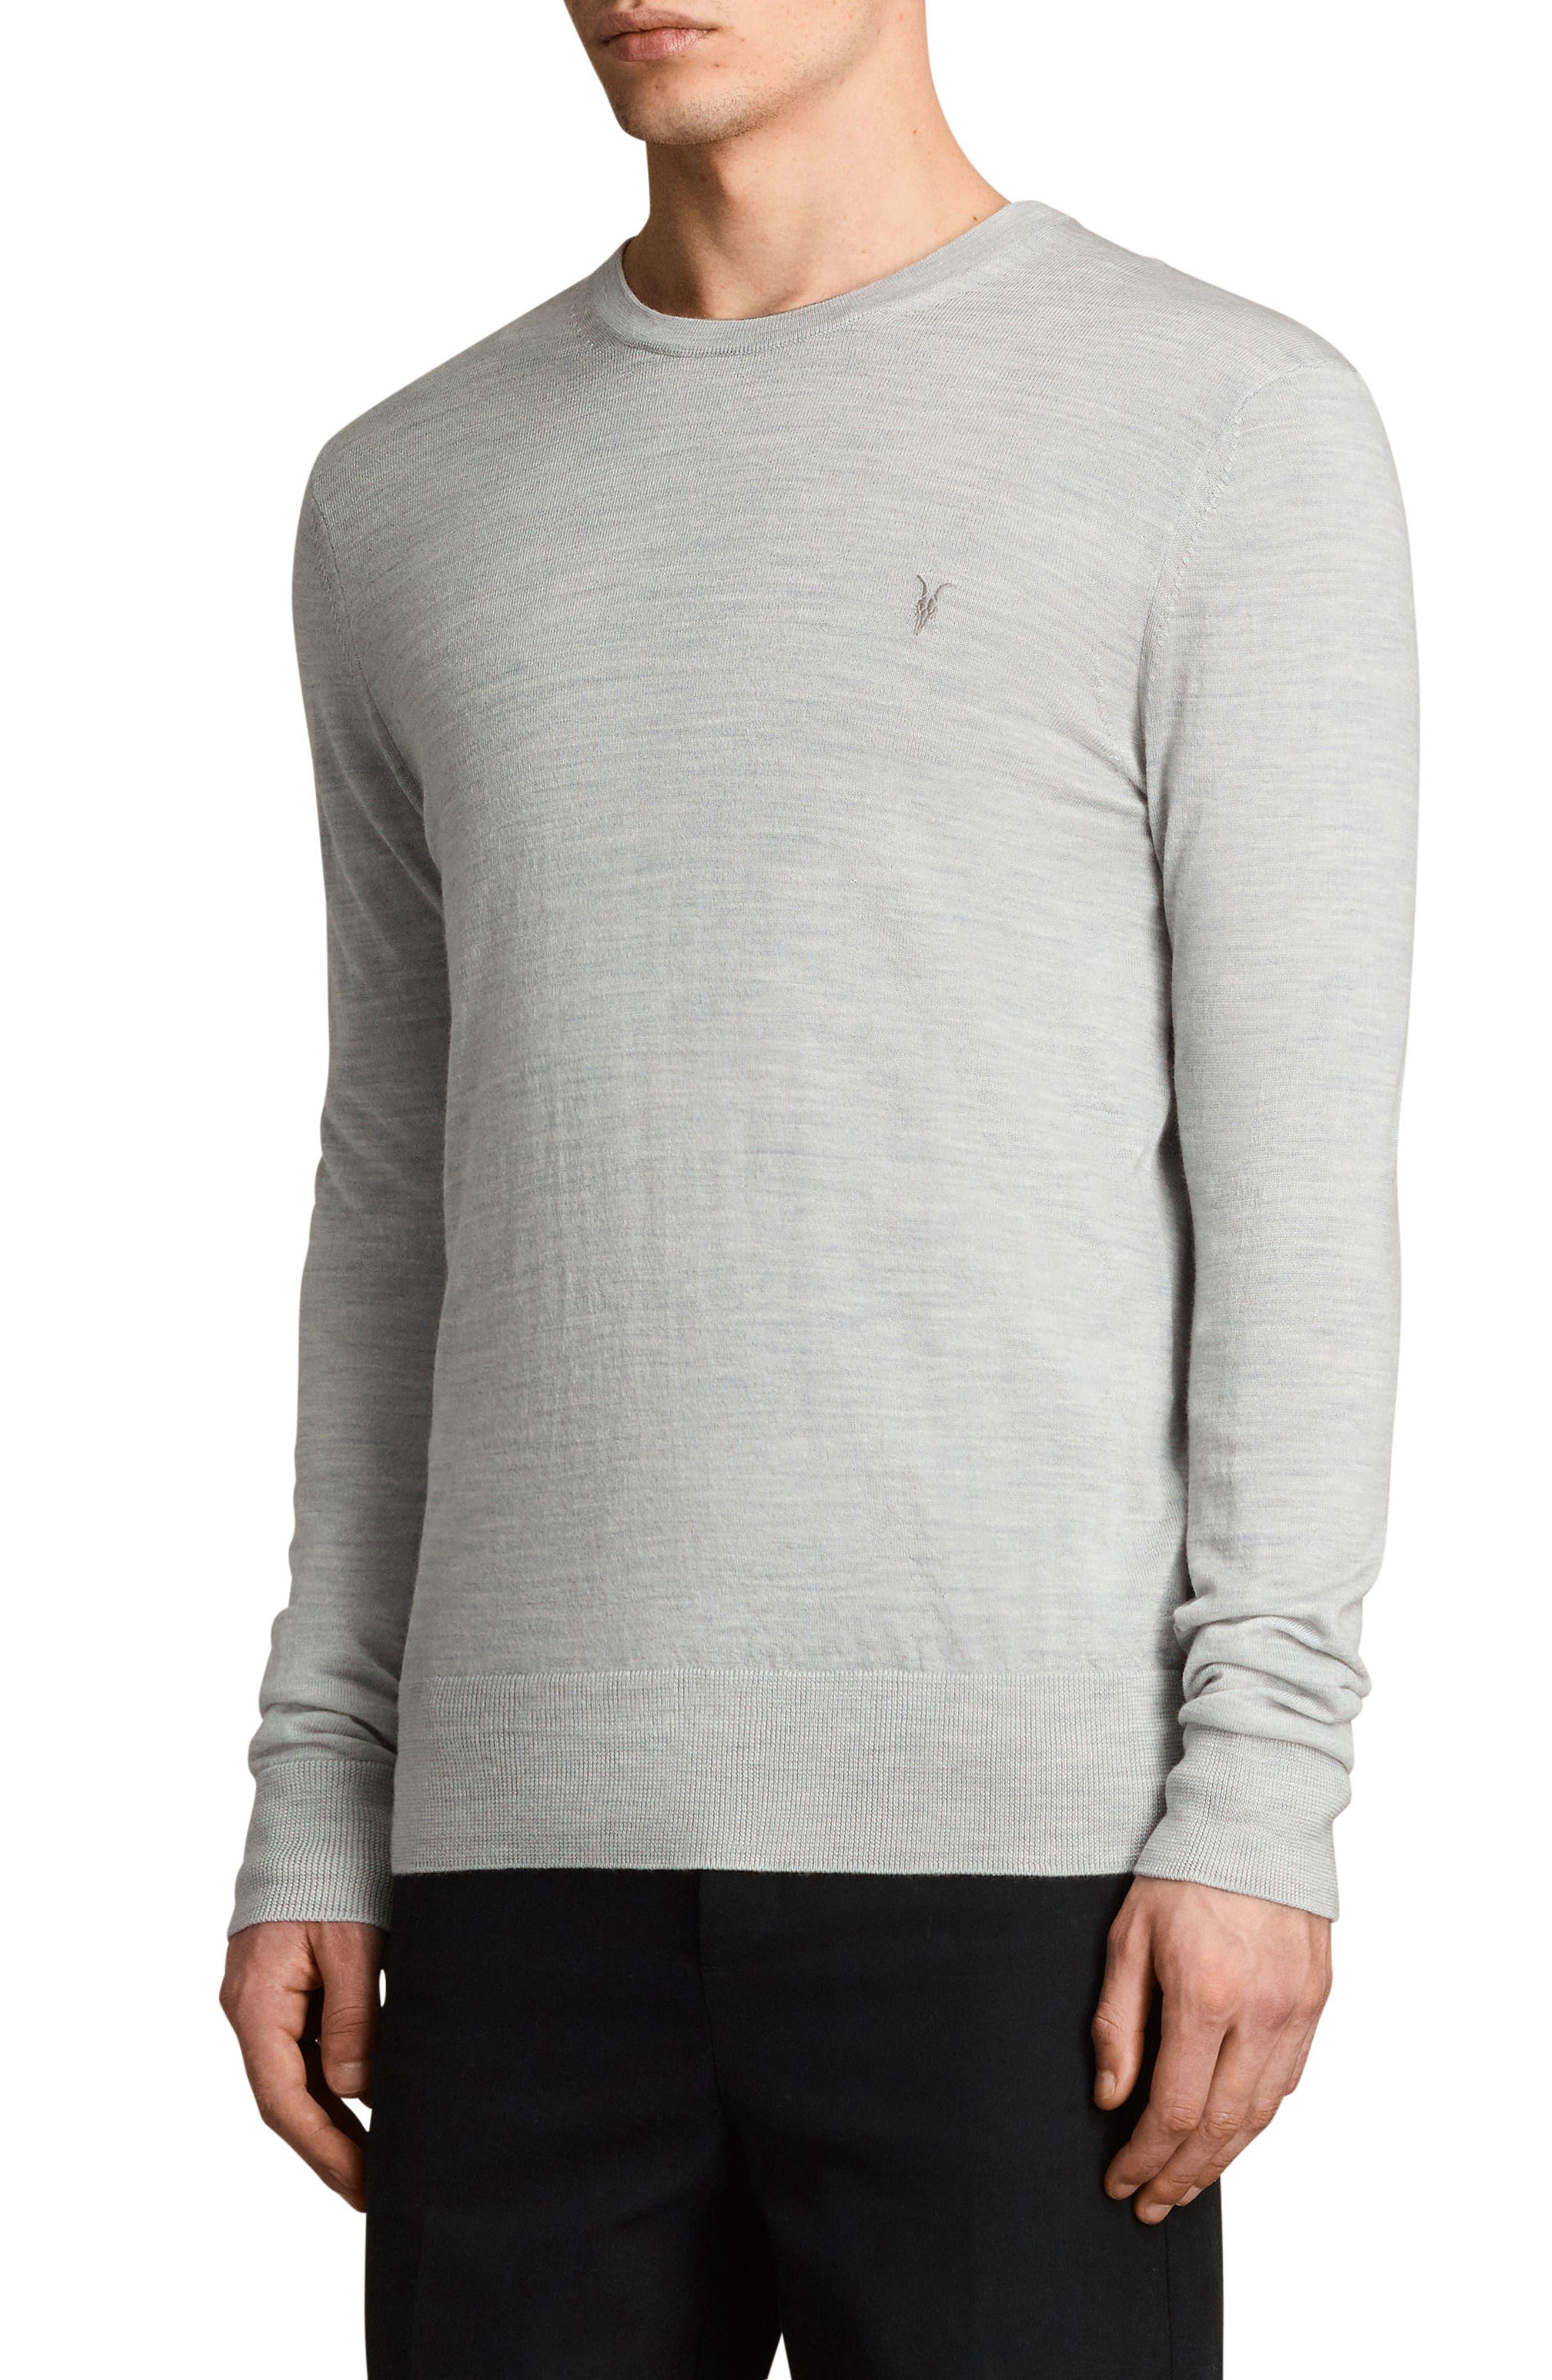 Mode Slim Fit Merino Wool Sweater,                             Alternate thumbnail 4, color,                             Light Grey Marl